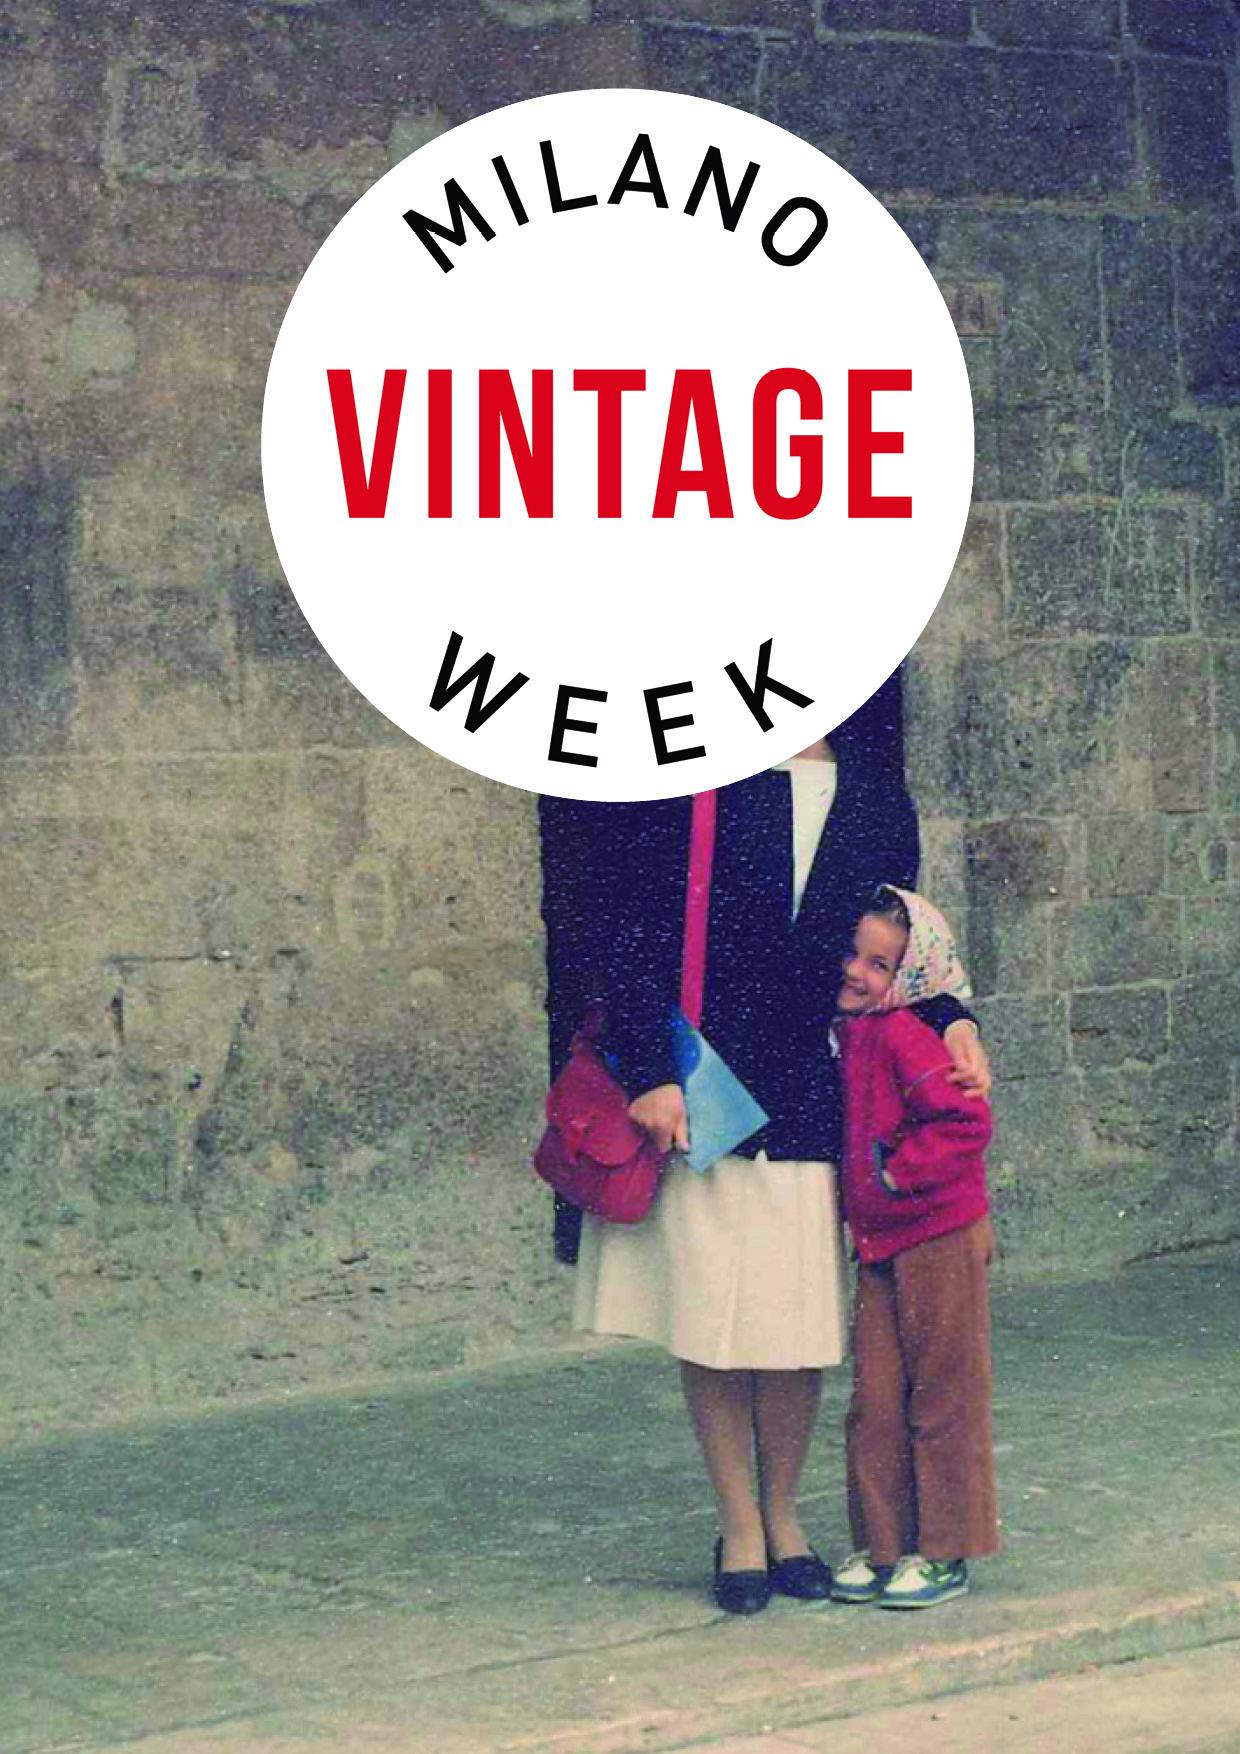 Milano Vintage Week_passeggiata, elisa bellino, theladycracy, fashion blog milano, best fashion bloggers, fashion event milano, fashion, fashion lover, vintage week, fashion vintage event, milano vintage week,